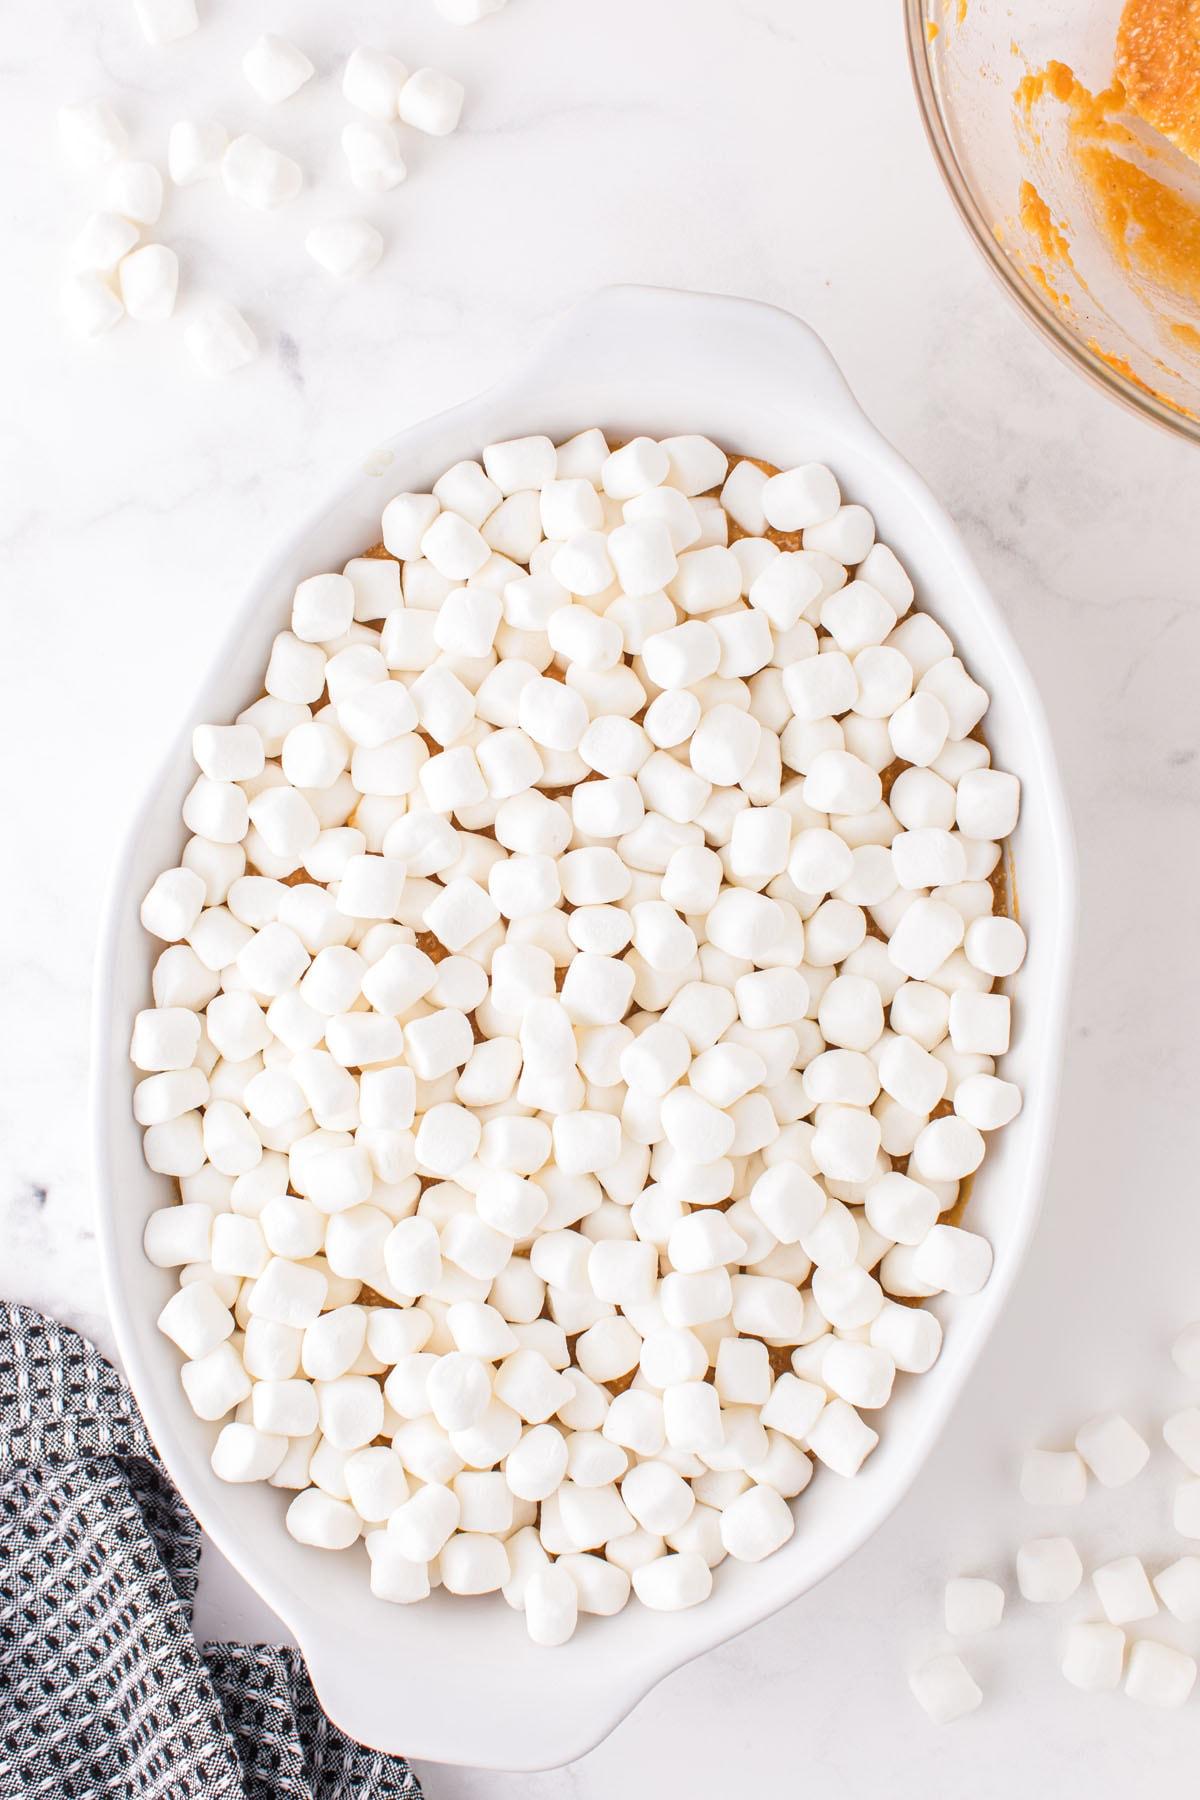 Sprinkle with mini marshmallows